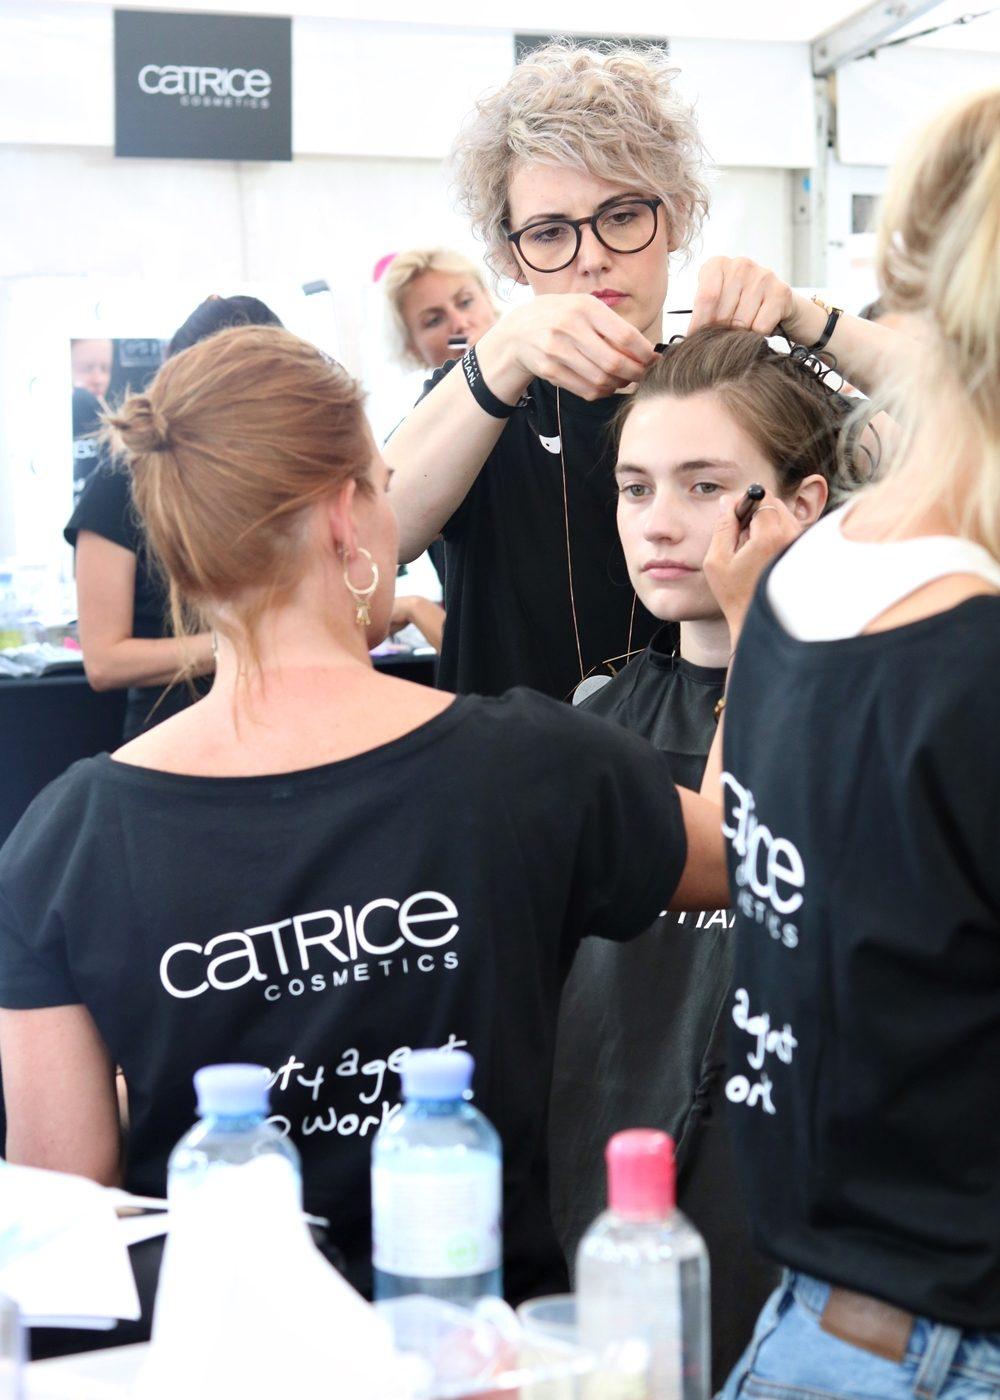 Mercedes Benz Fashion Week Berlin Juli 2016 Berliner Mode Vladimir Karaleev backstage (3)